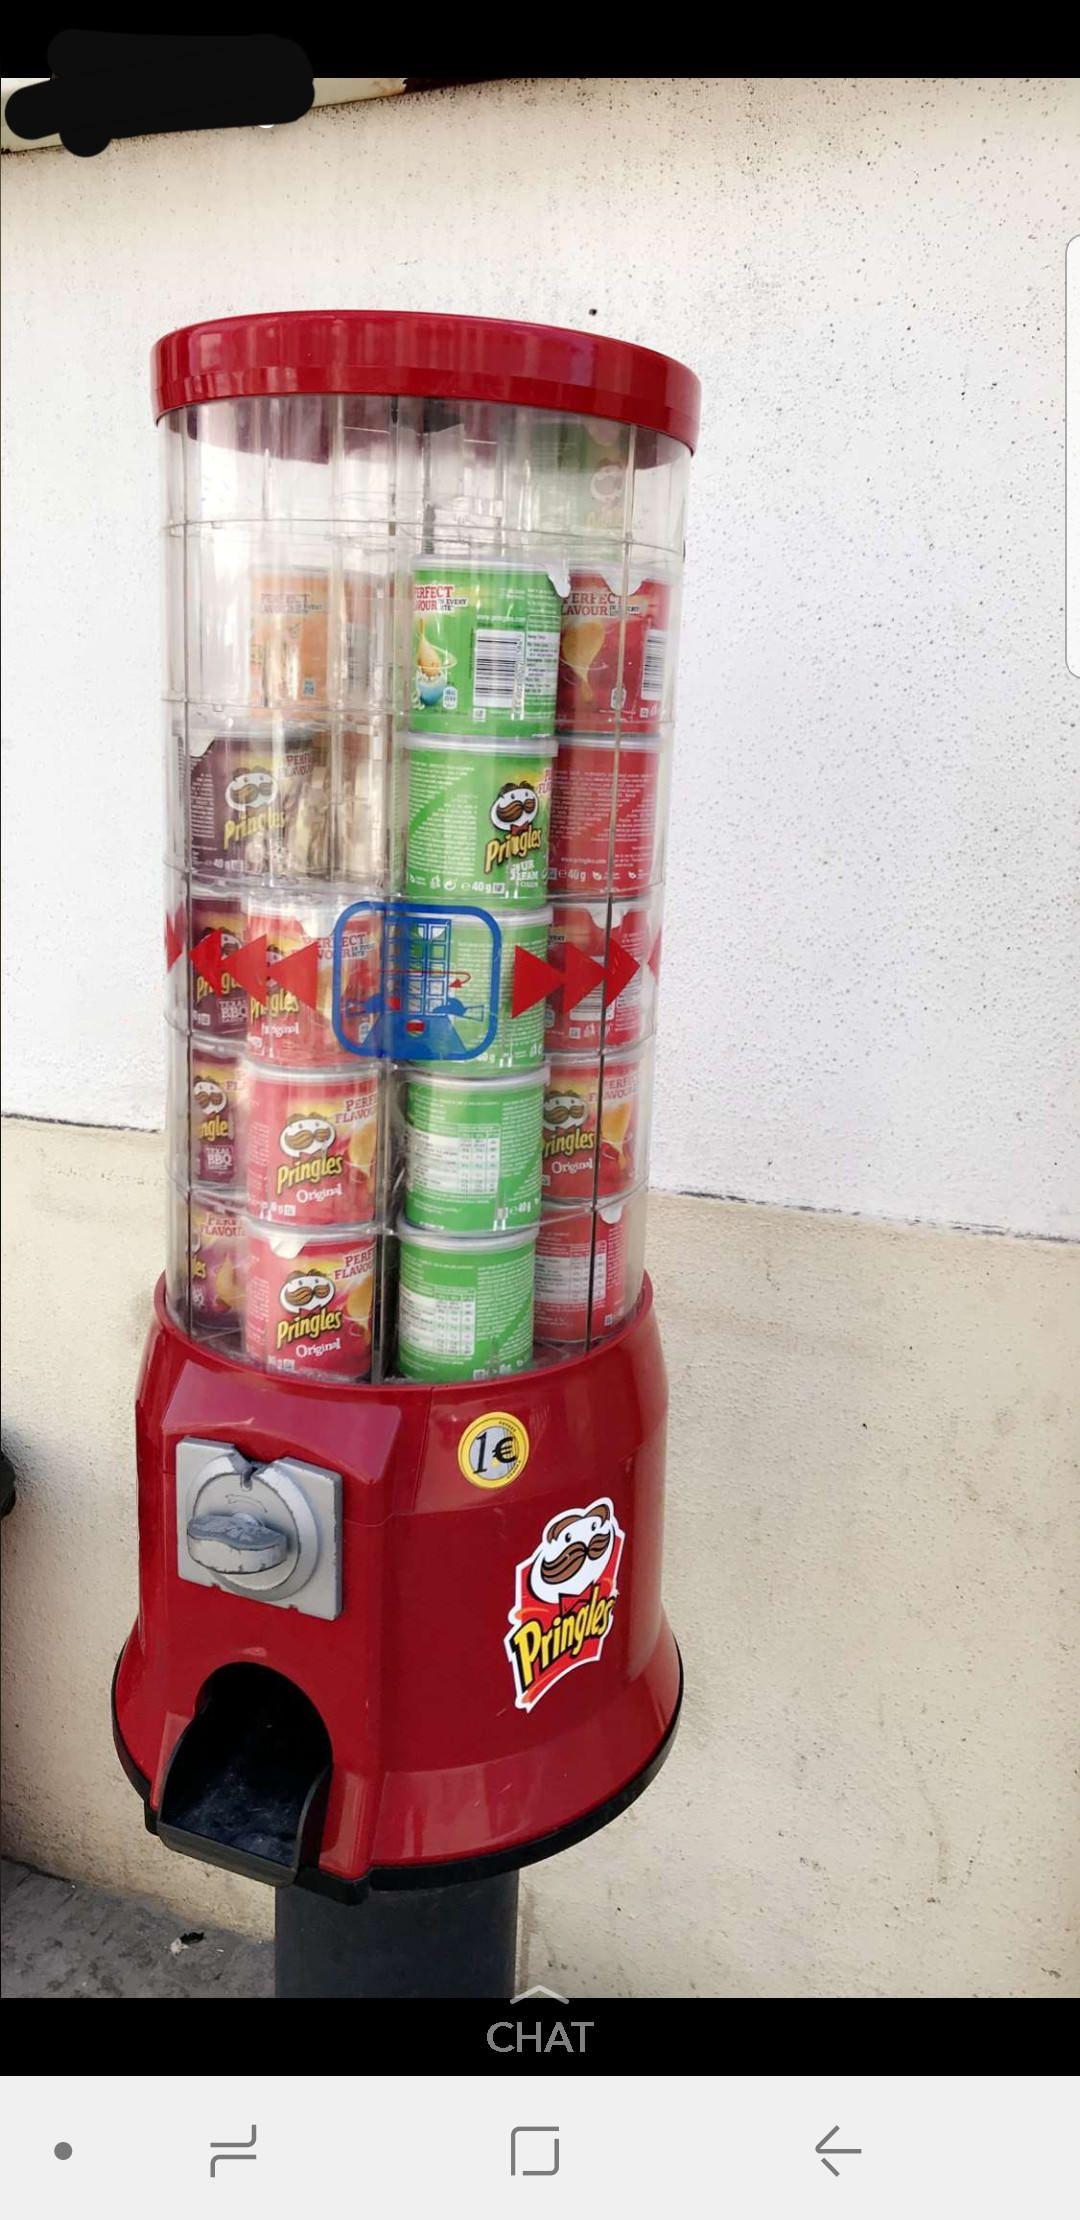 This Pringles Vending Machine Healthy Dinner Recipes Stuffed Pork Tenderloin 500 Calories